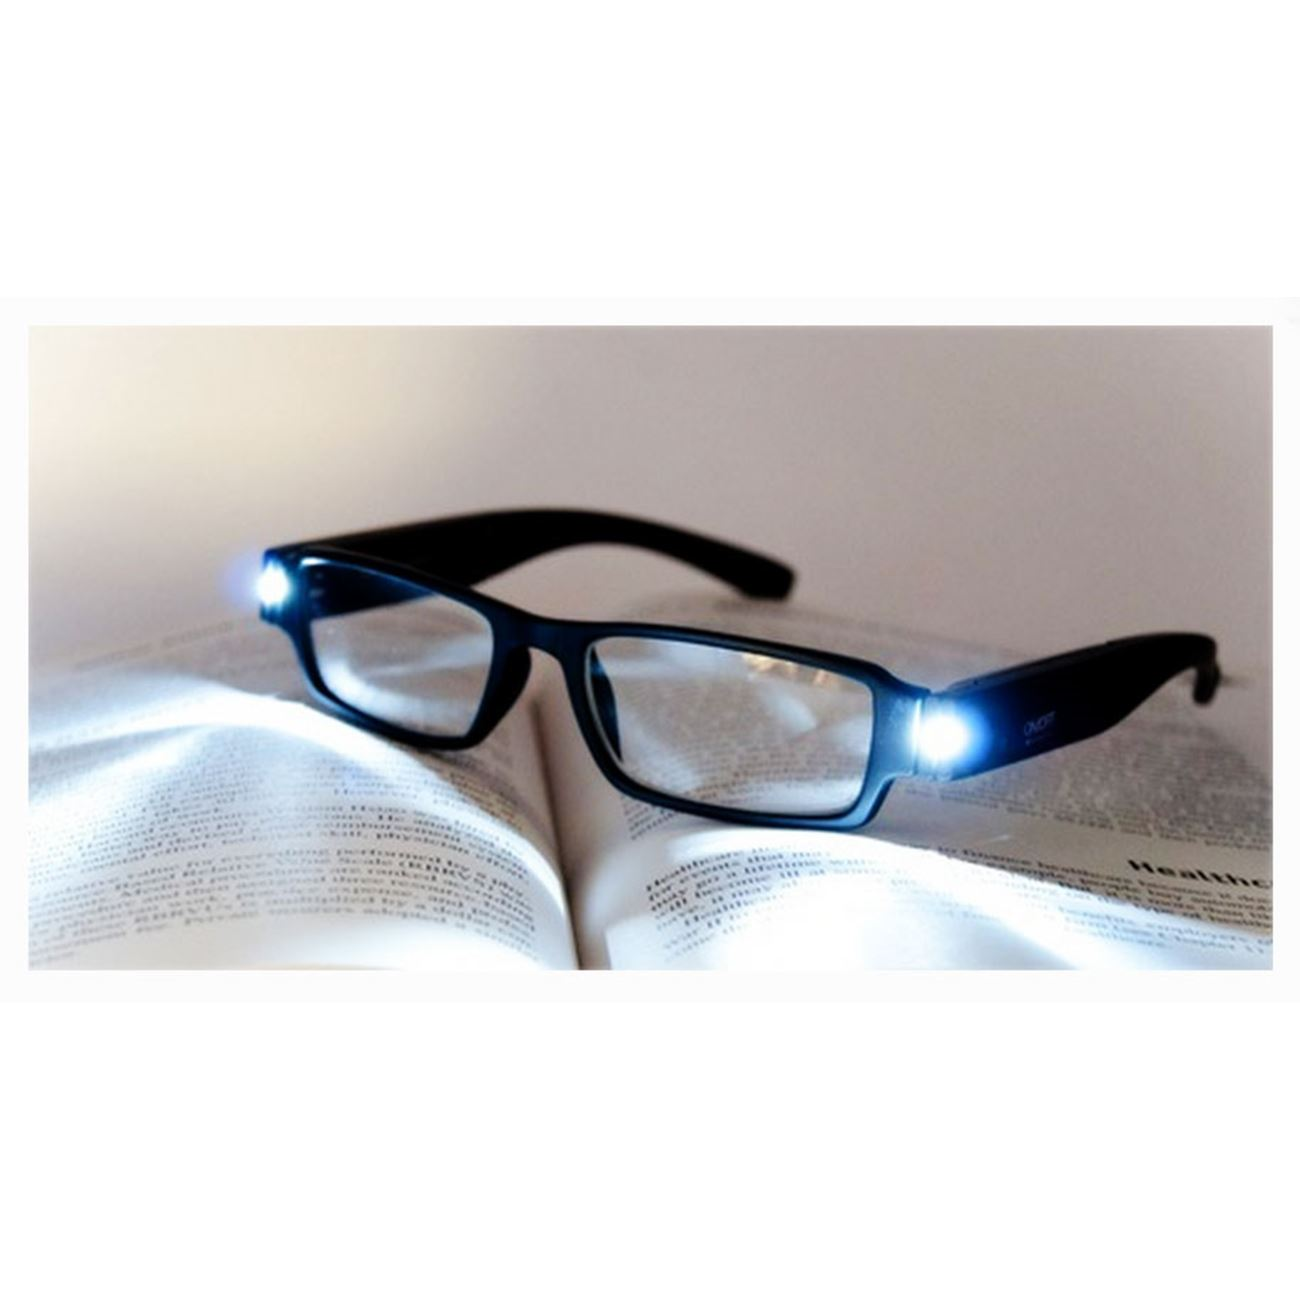 56f76047b9 Γυαλιά πρεσβυωπίας με Led φωτισμό για διάβασμα και λοιπές εργασίες (Δείτε  βίντεο)   Γυαλιά πρεσβυωπίας